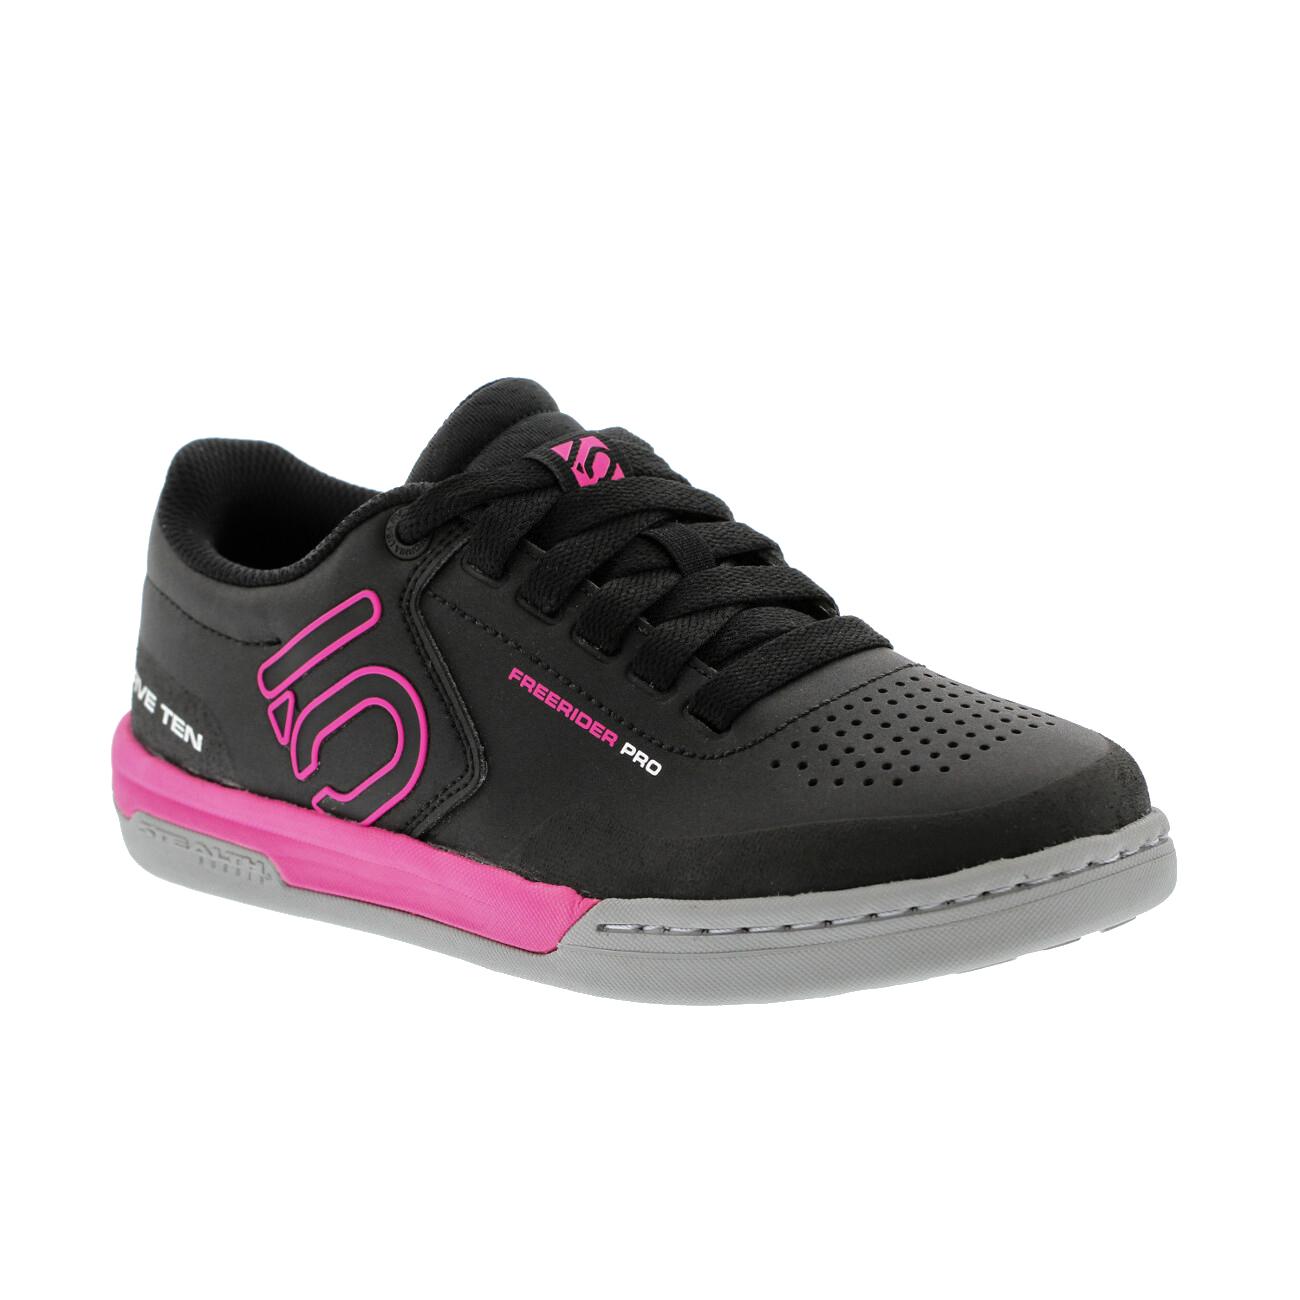 Fiveten Freerider Pro Womens black/pink UK 4 / EU 37 jEmxbBl